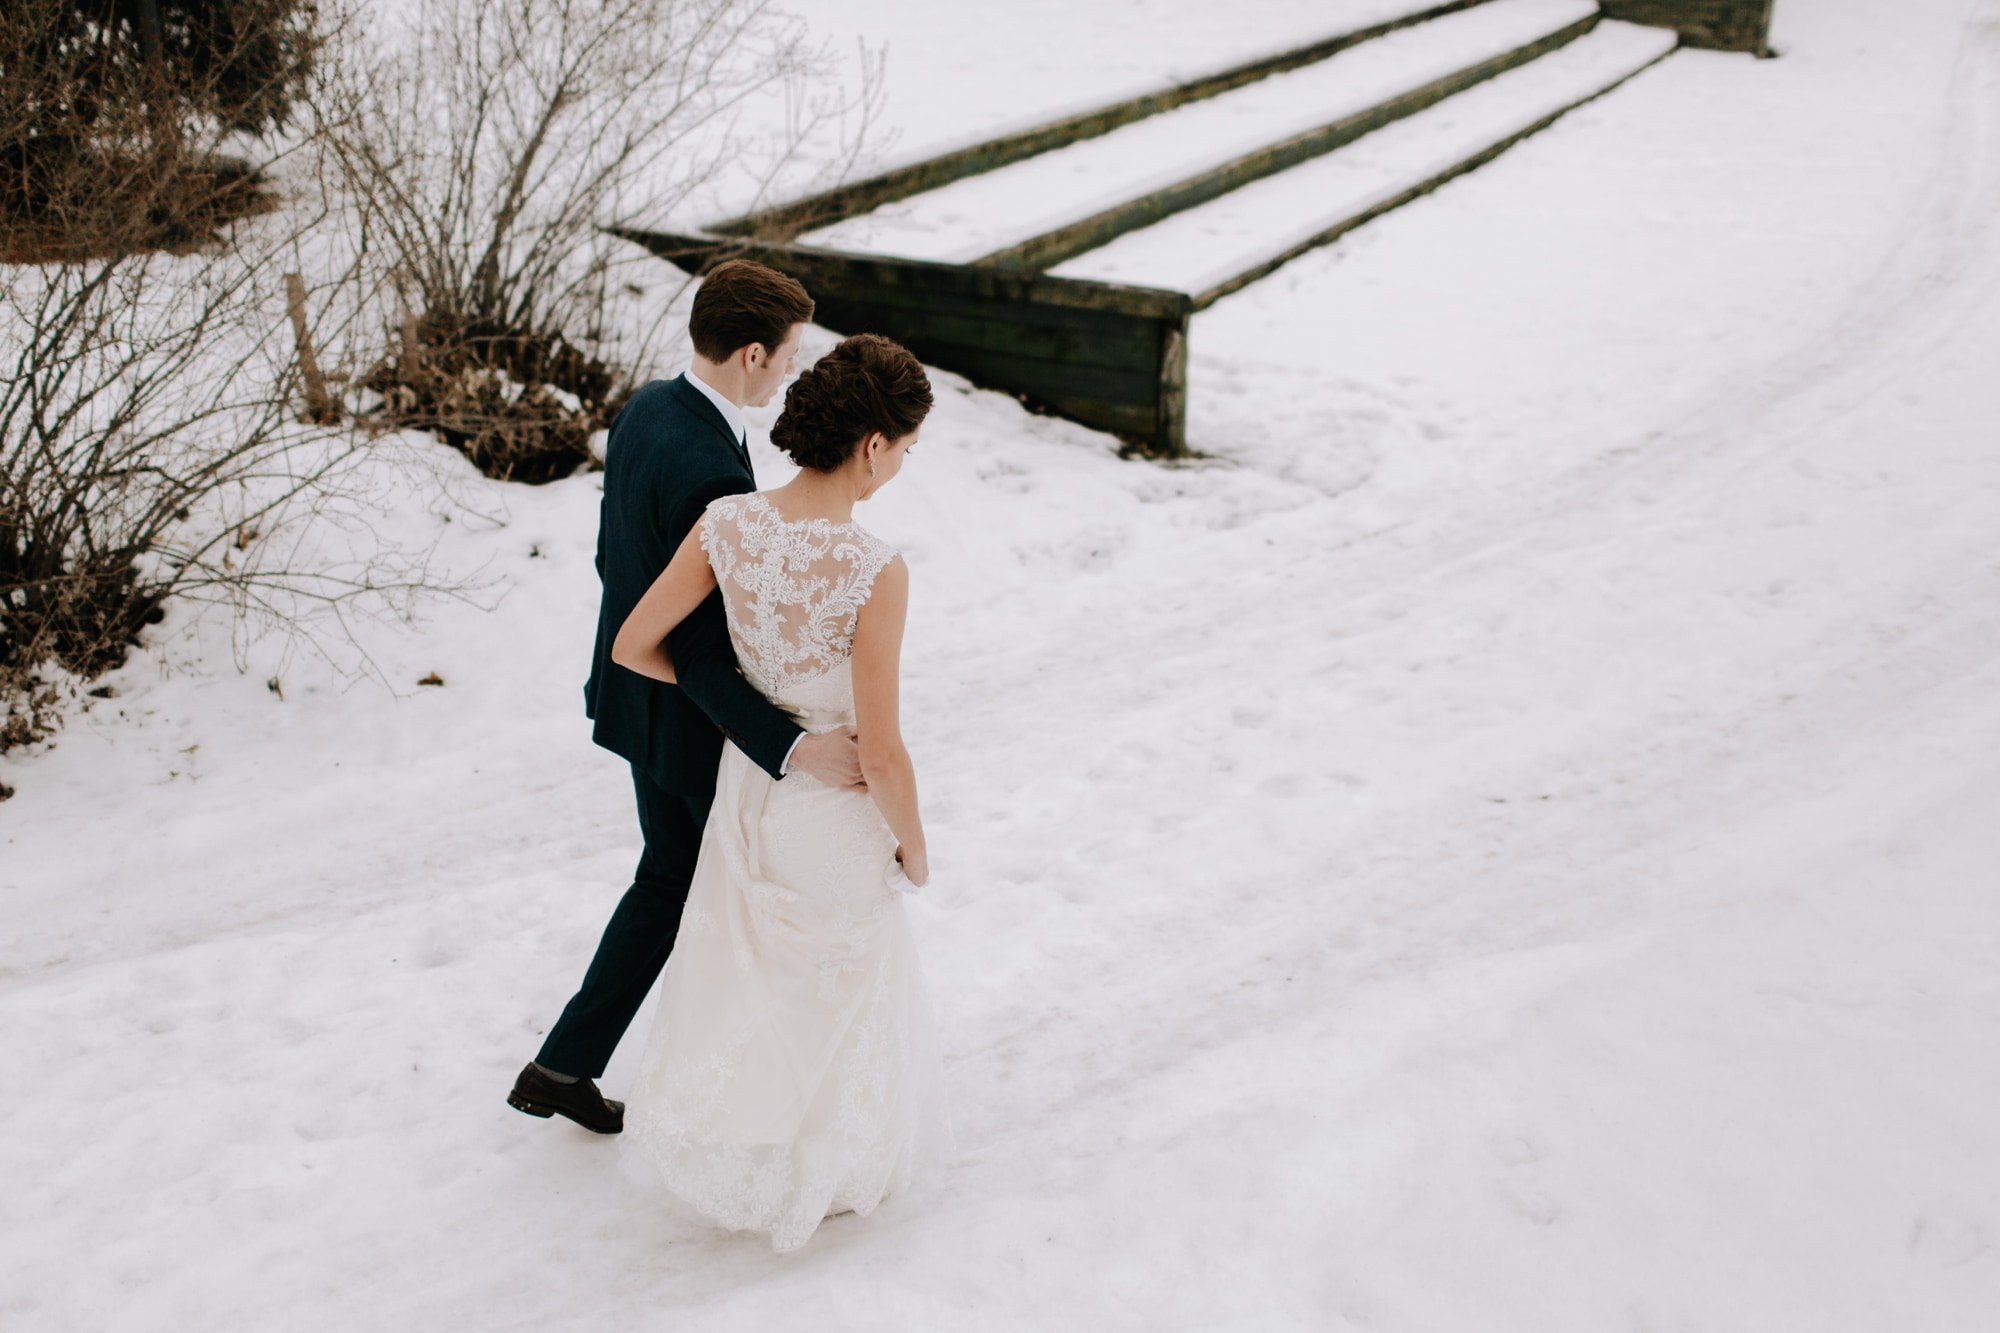 Nicollet-Island-Pavilion-Winter-Wedding-Minneapolis_19.jpg